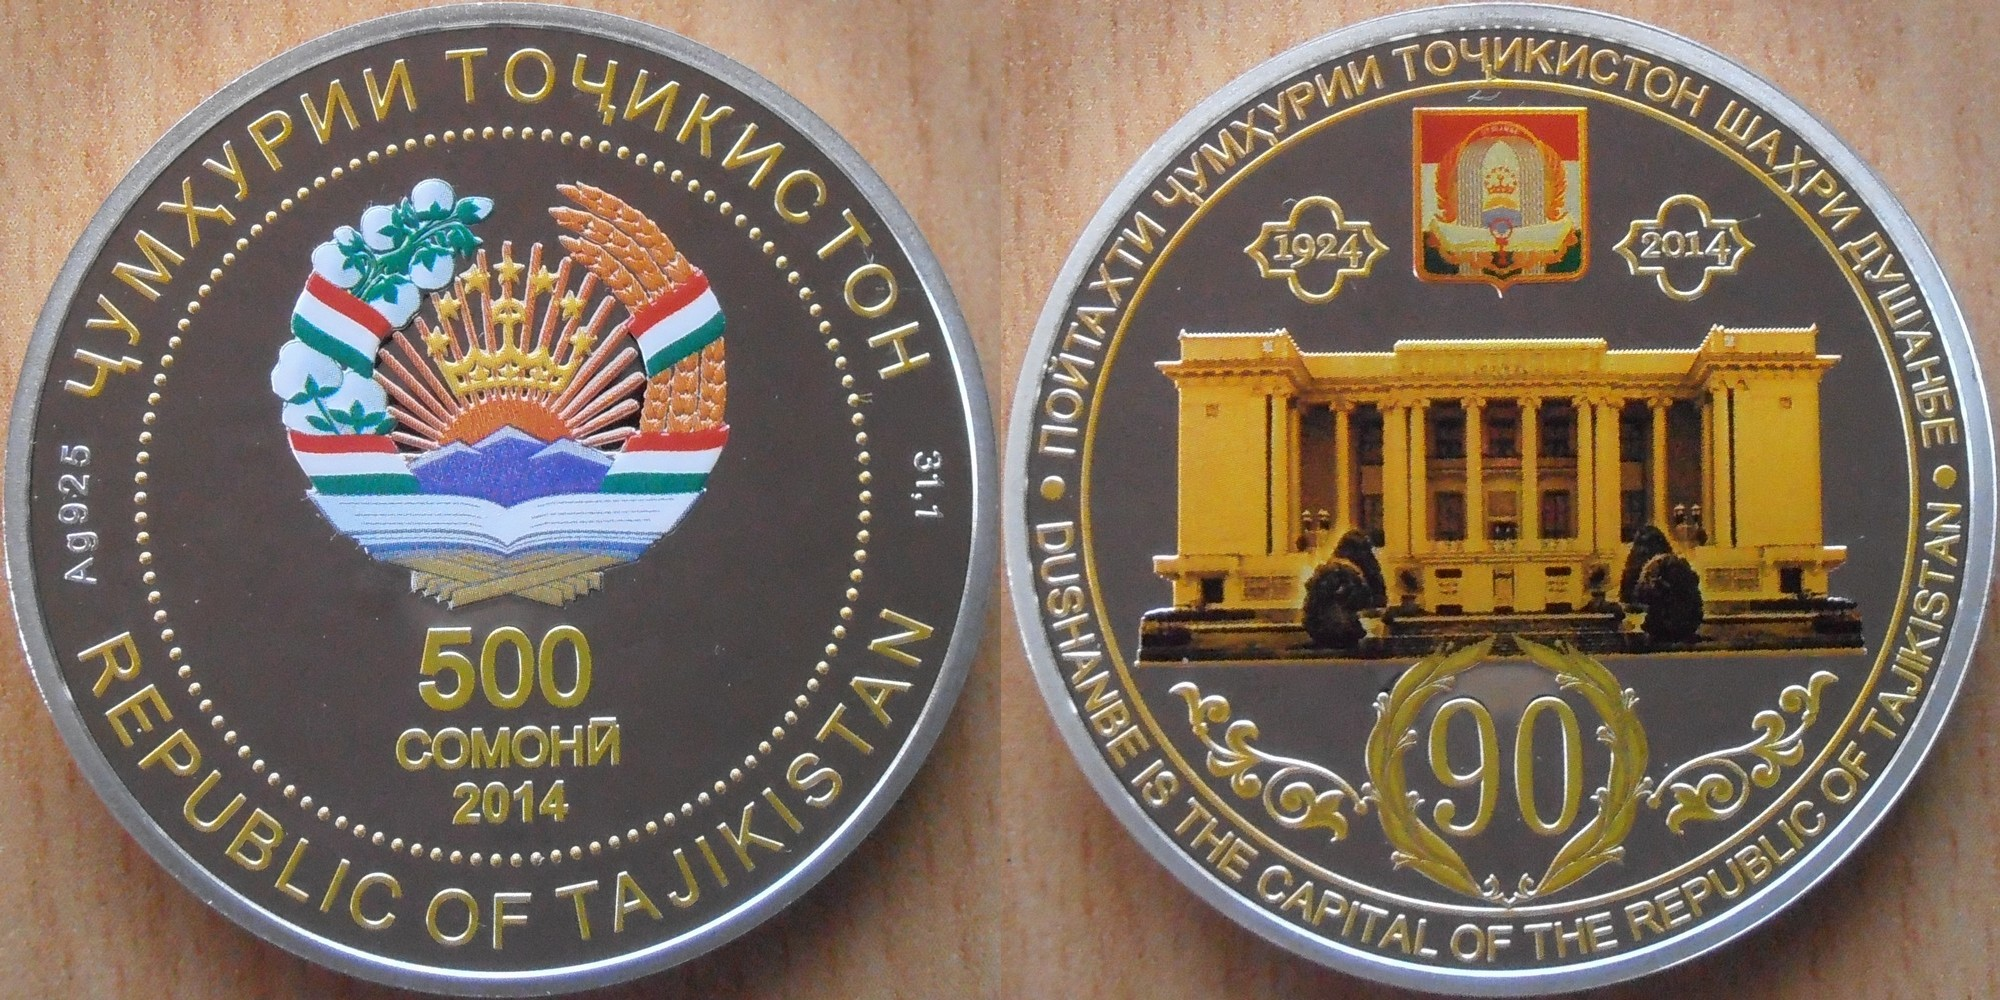 tadjikistan 2014 - théâtre de l'opéra